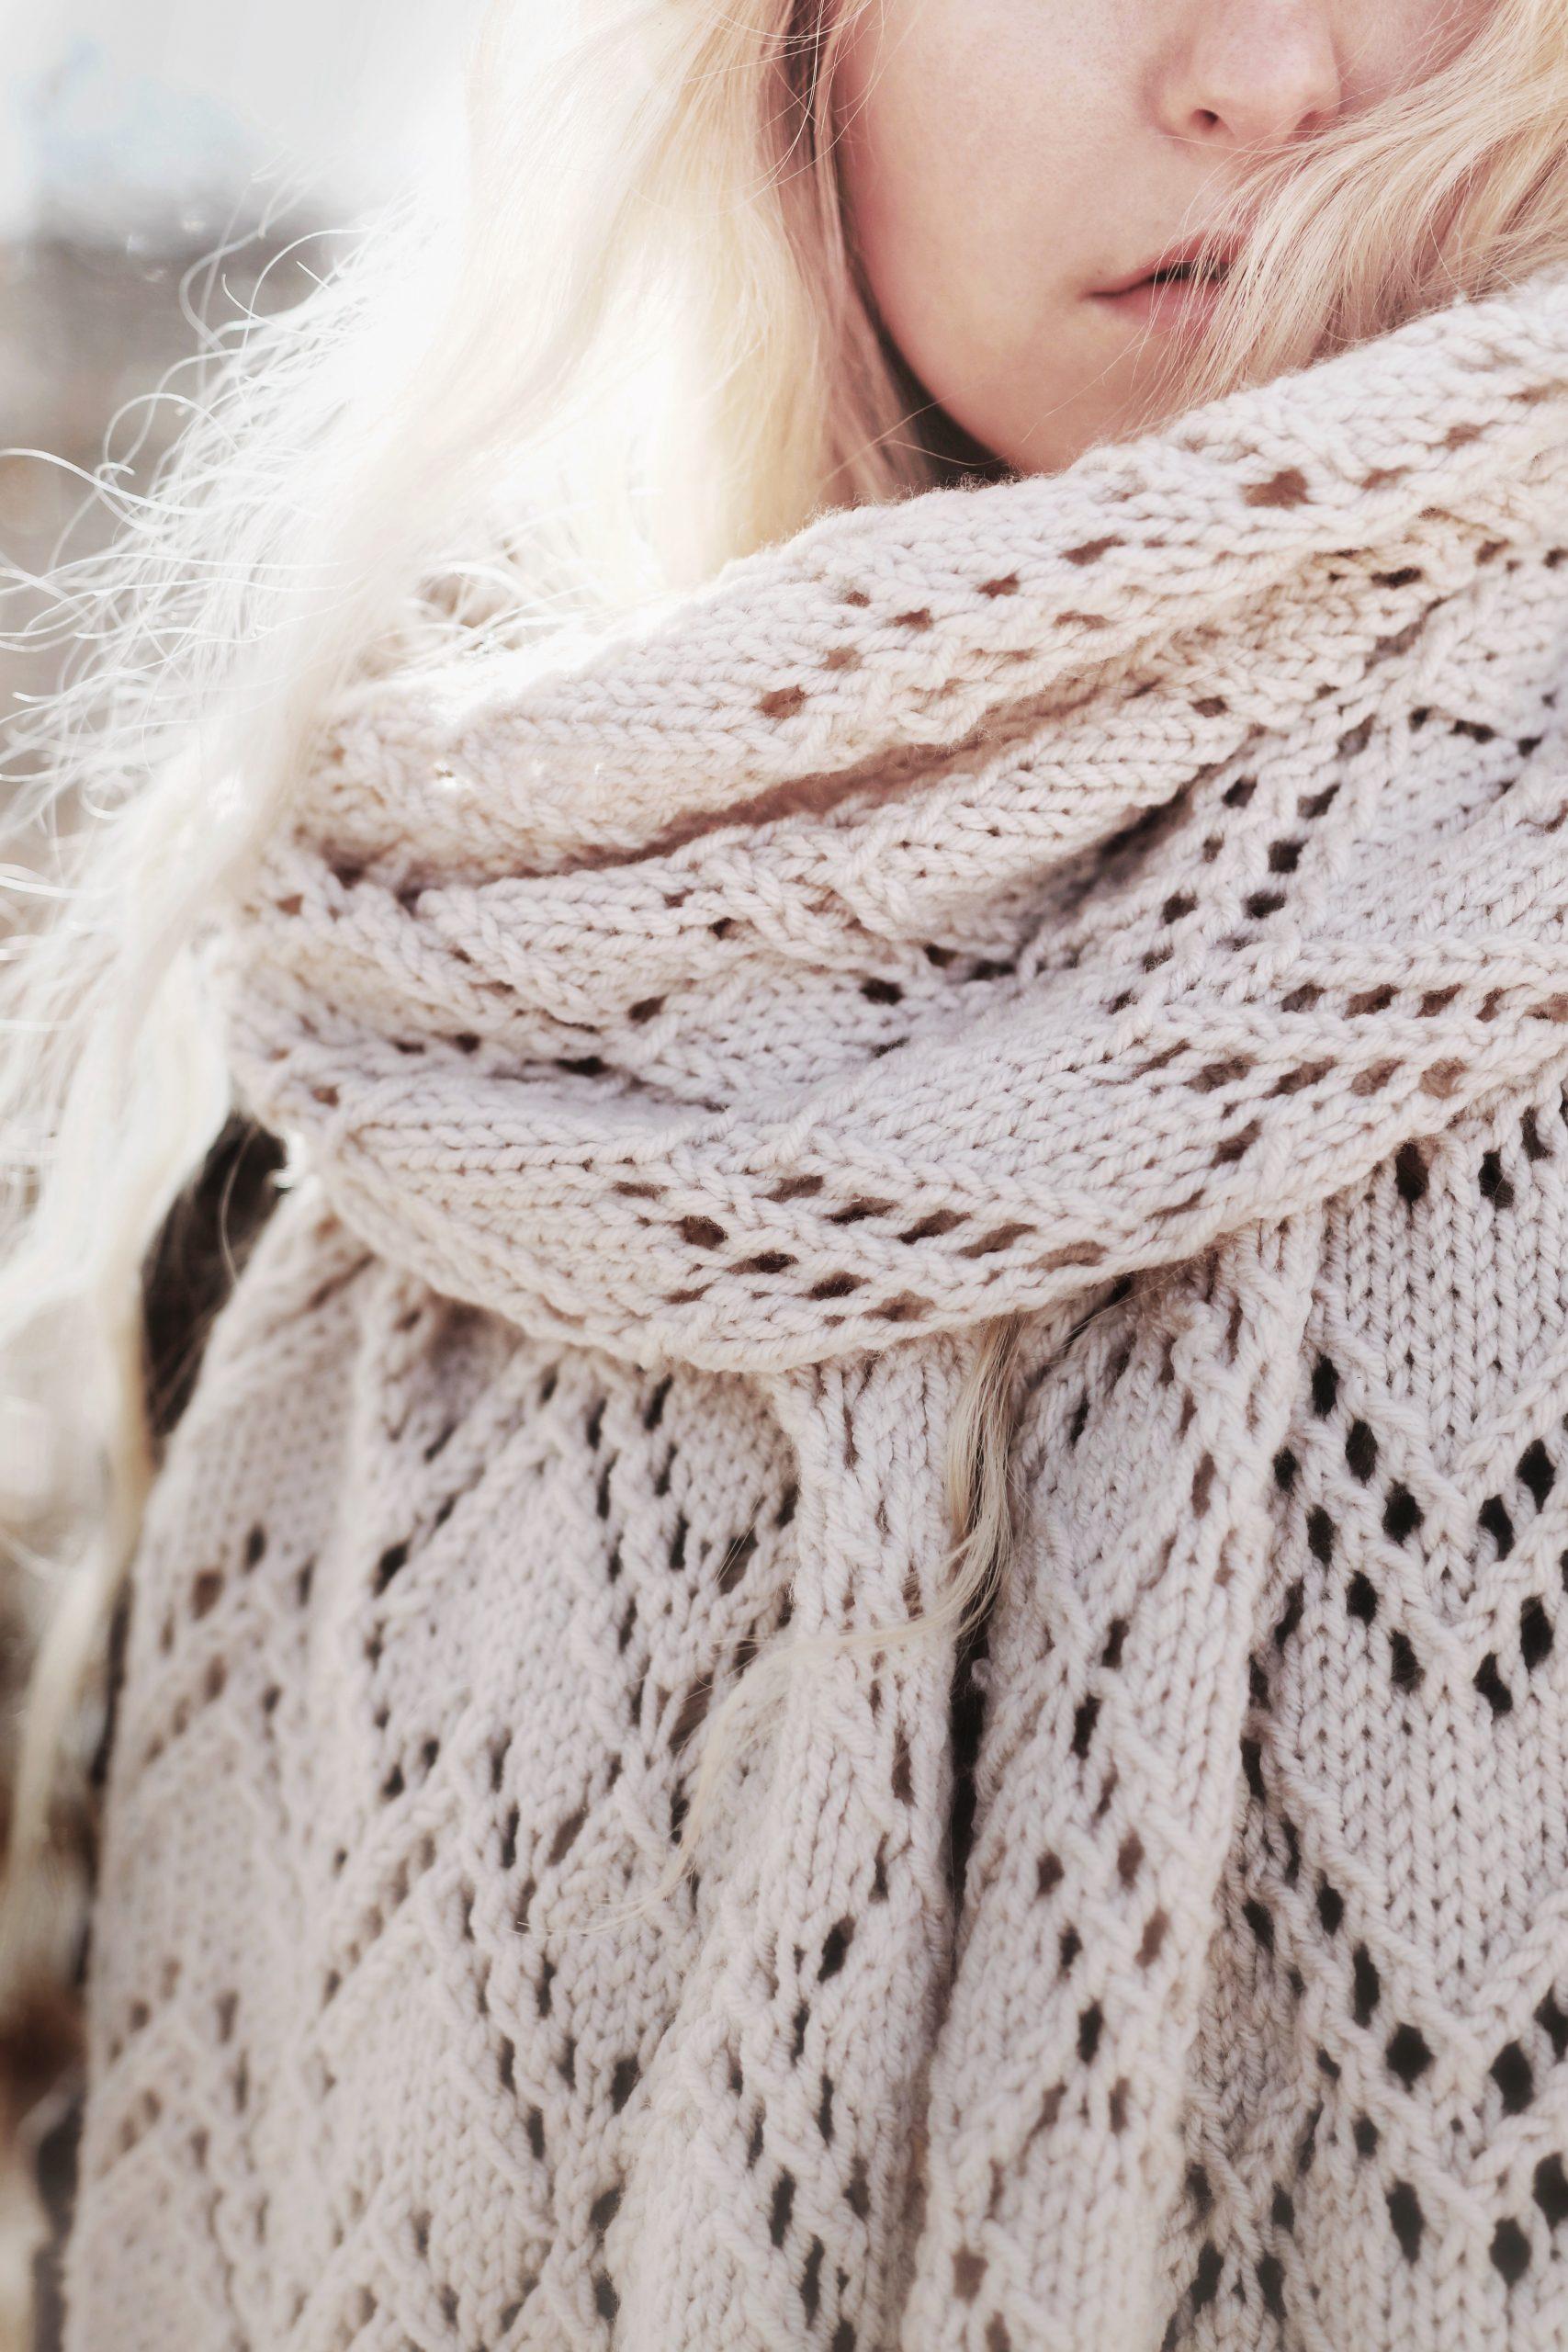 Glacier Scarf Knitting Pattern By Darling Jadore